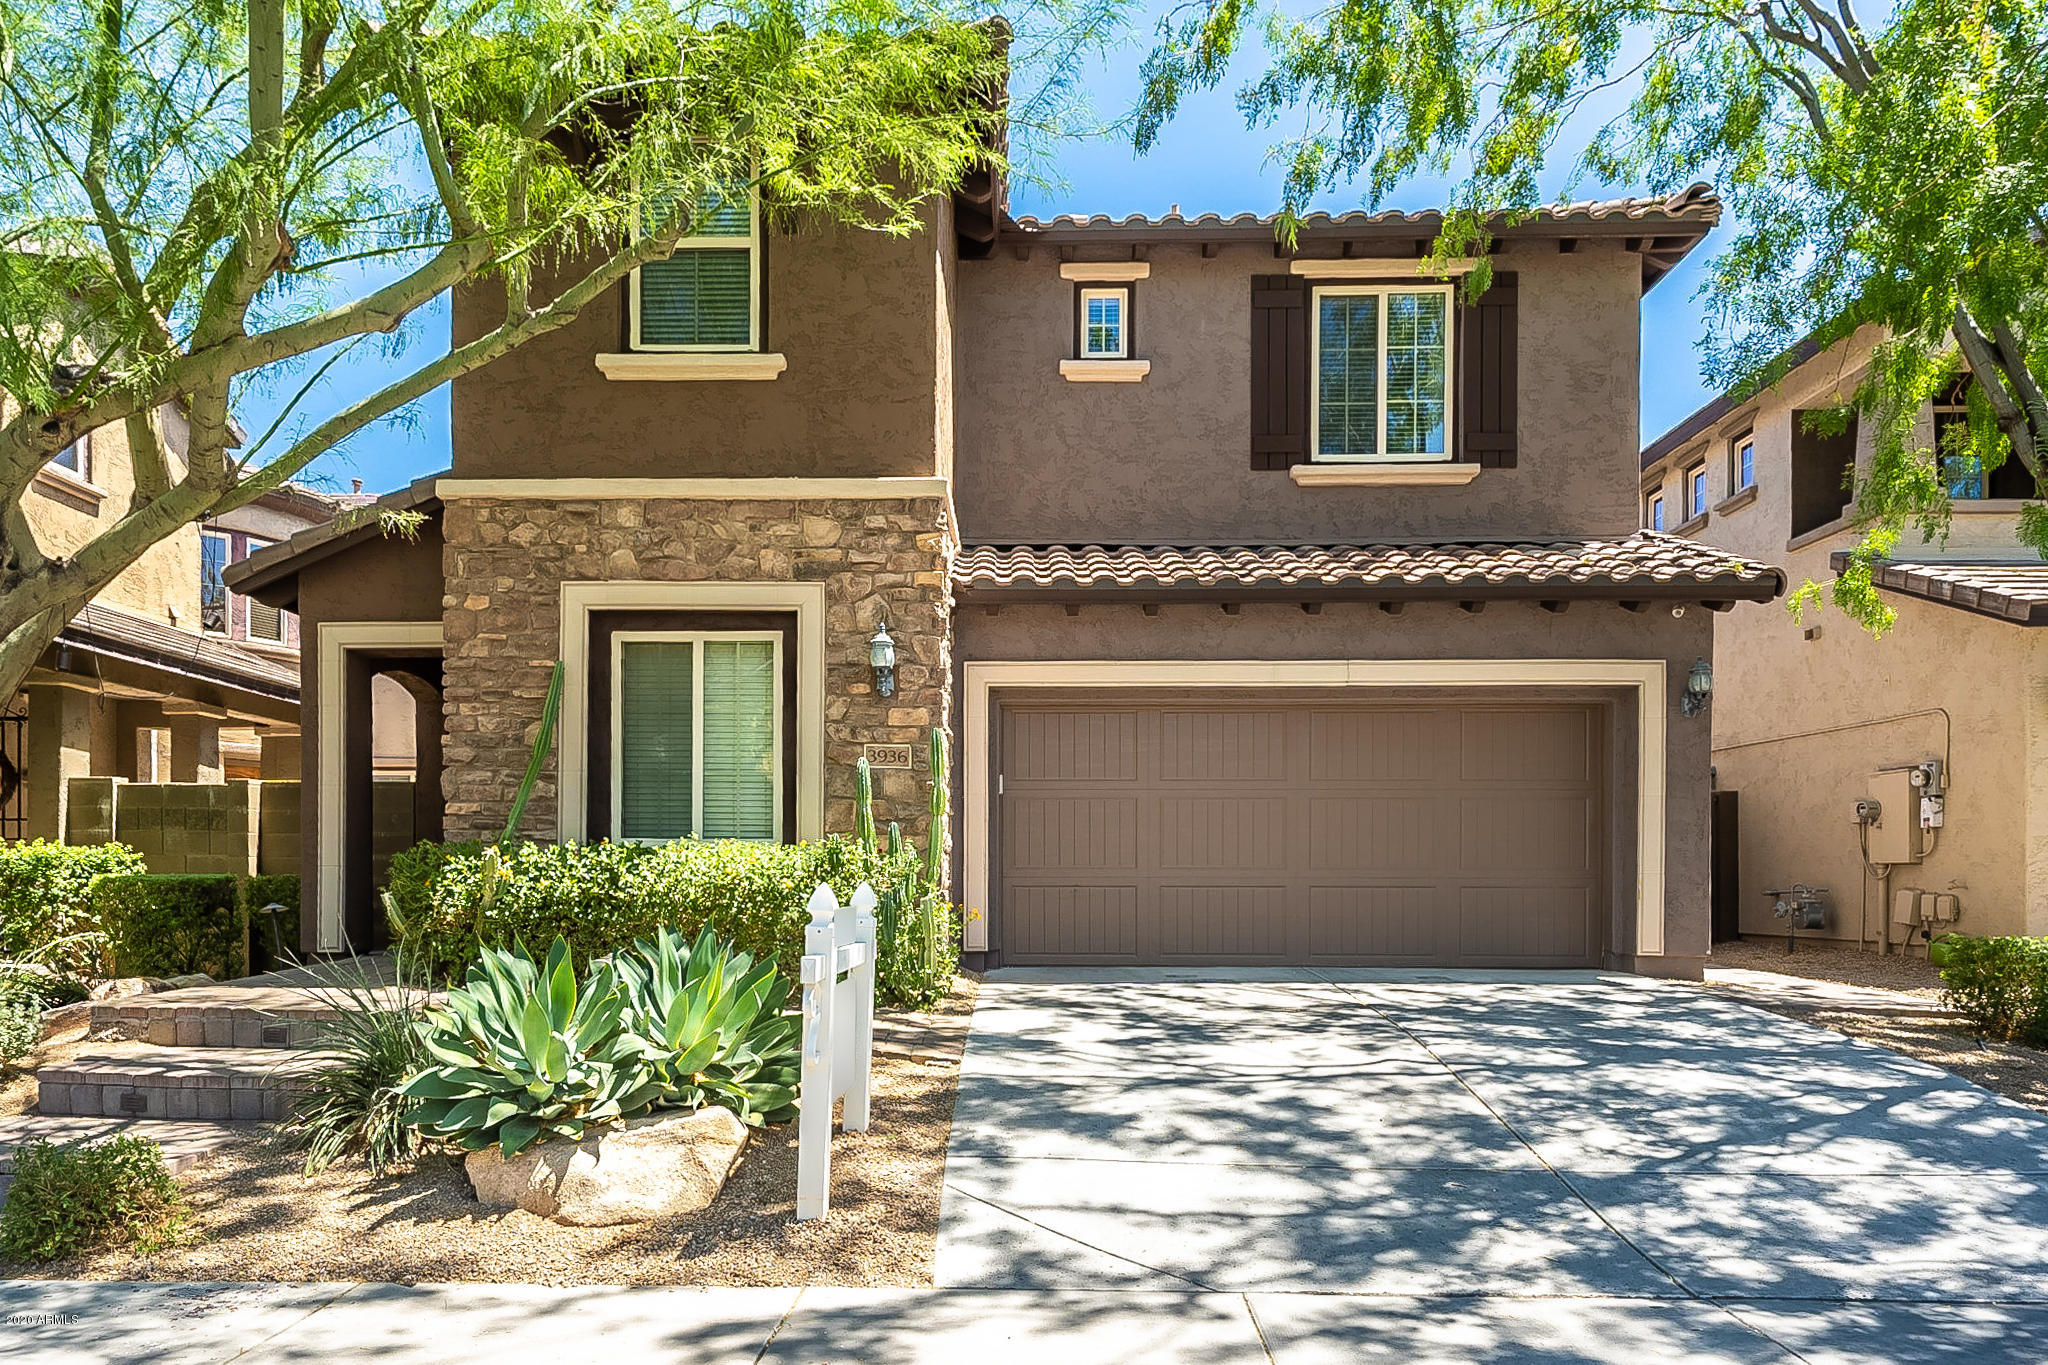 Photo of 3936 E HALF HITCH Place, Phoenix, AZ 85050